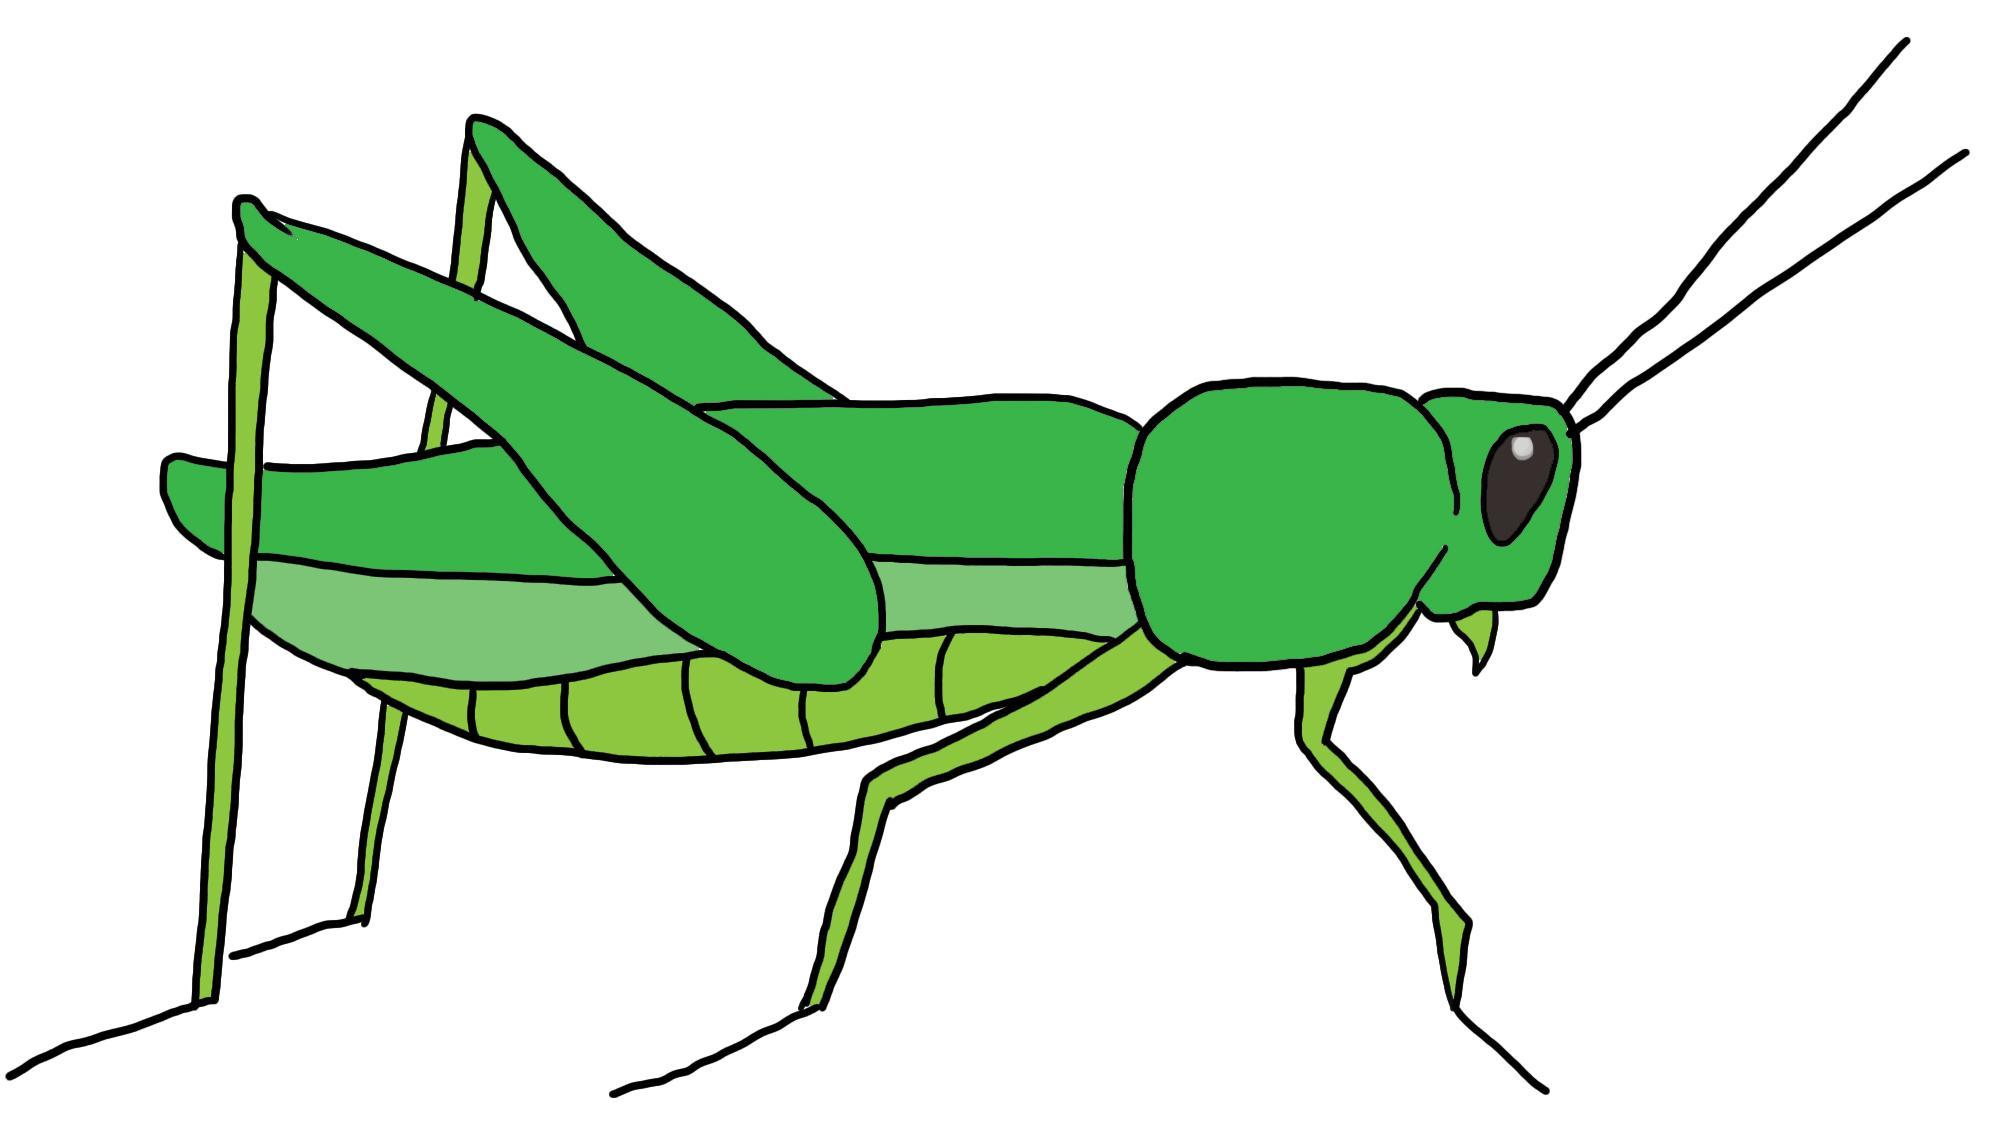 2000x1126 Unique Grasshopper Clipart Design